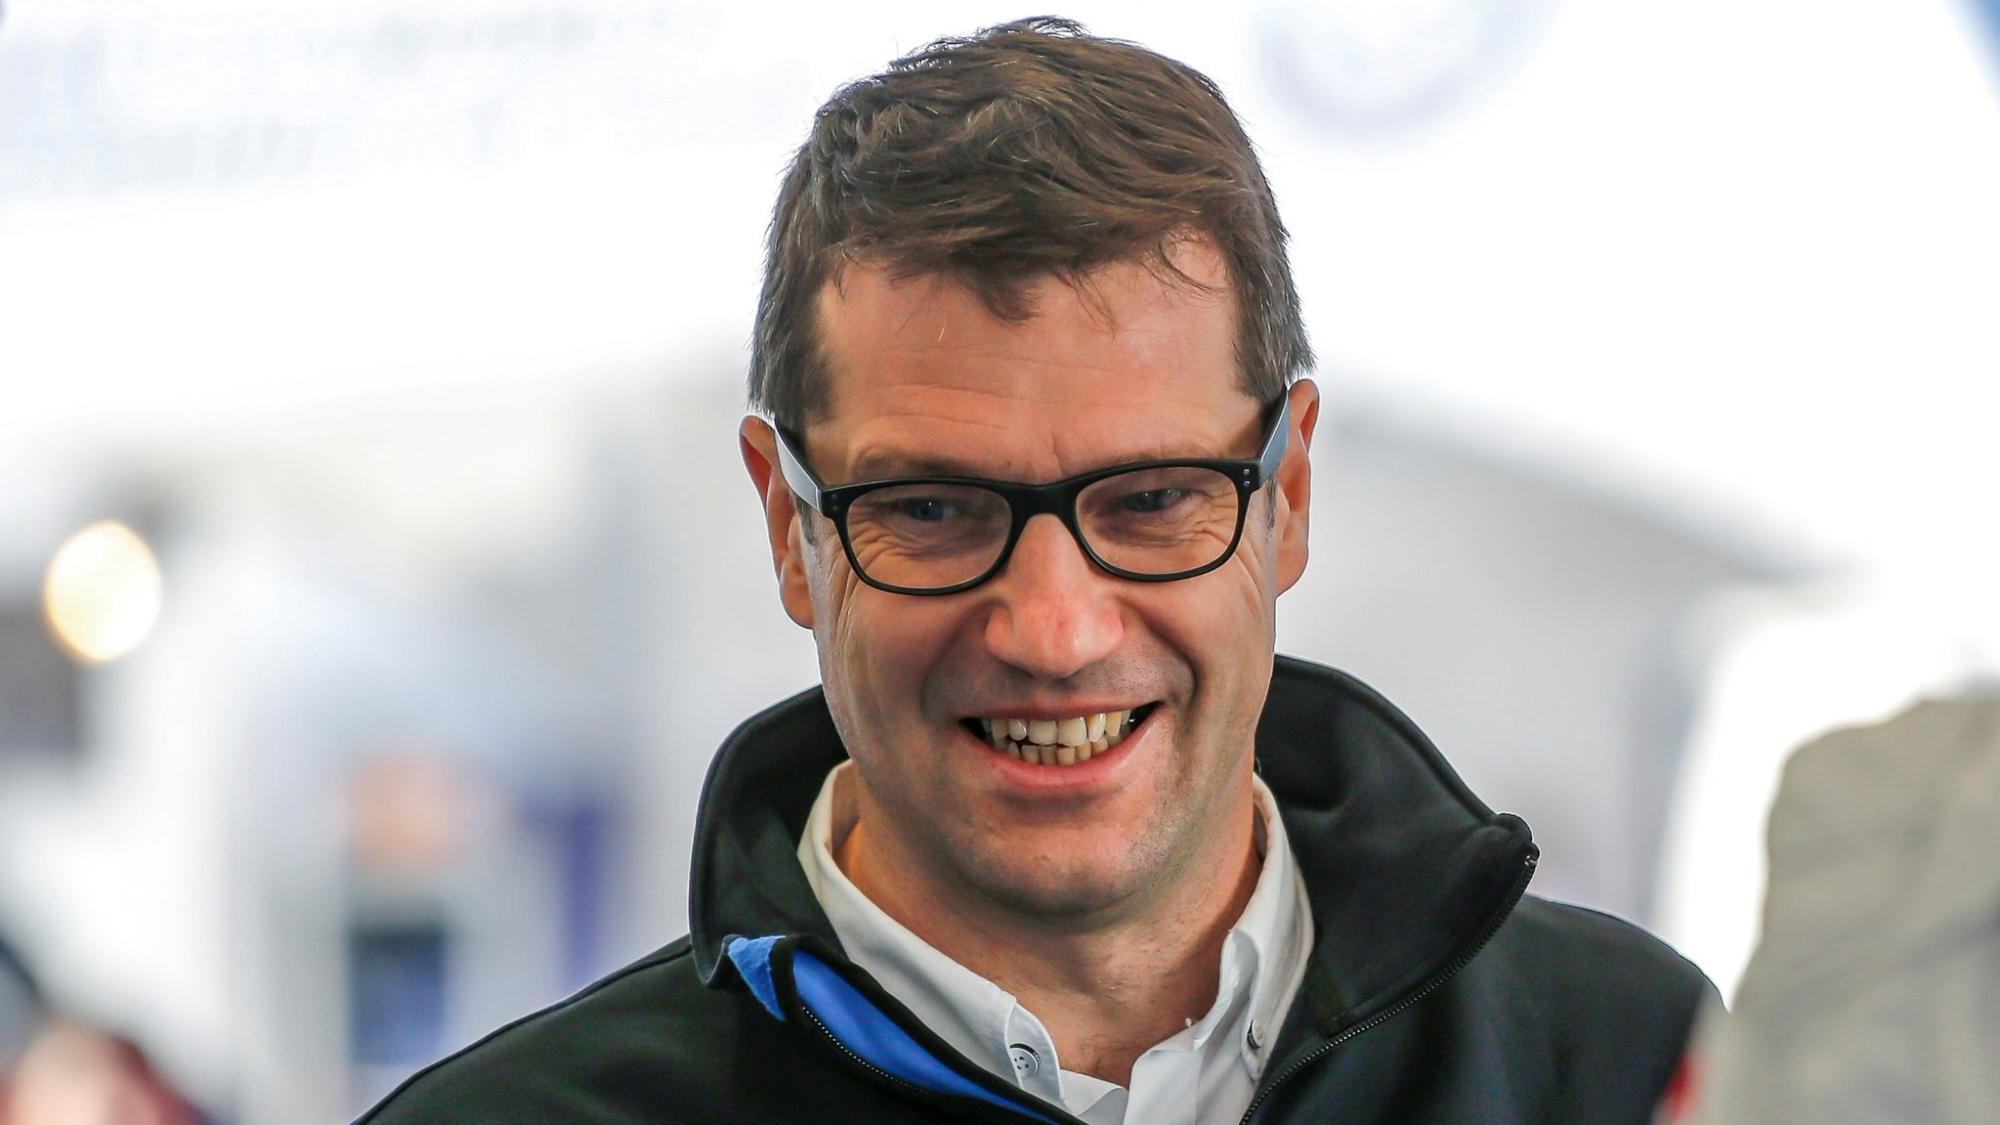 François-Xavier Demaison, Williams Racing